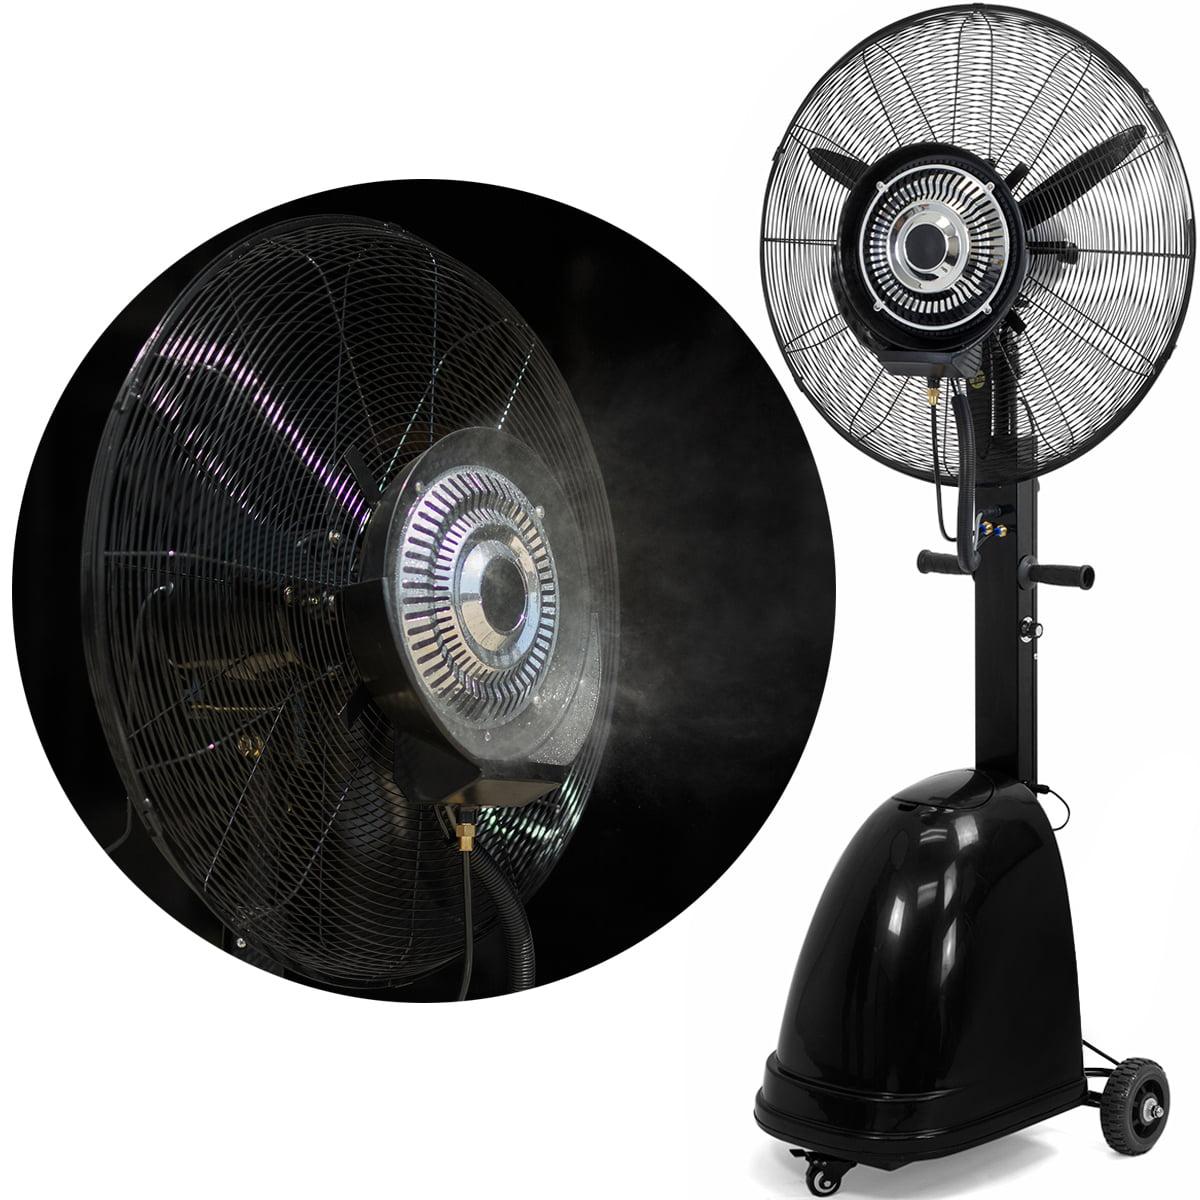 Patio Porch Oscillating Metal Cooling Outdoor Misting Fan Standing Floor 18 in